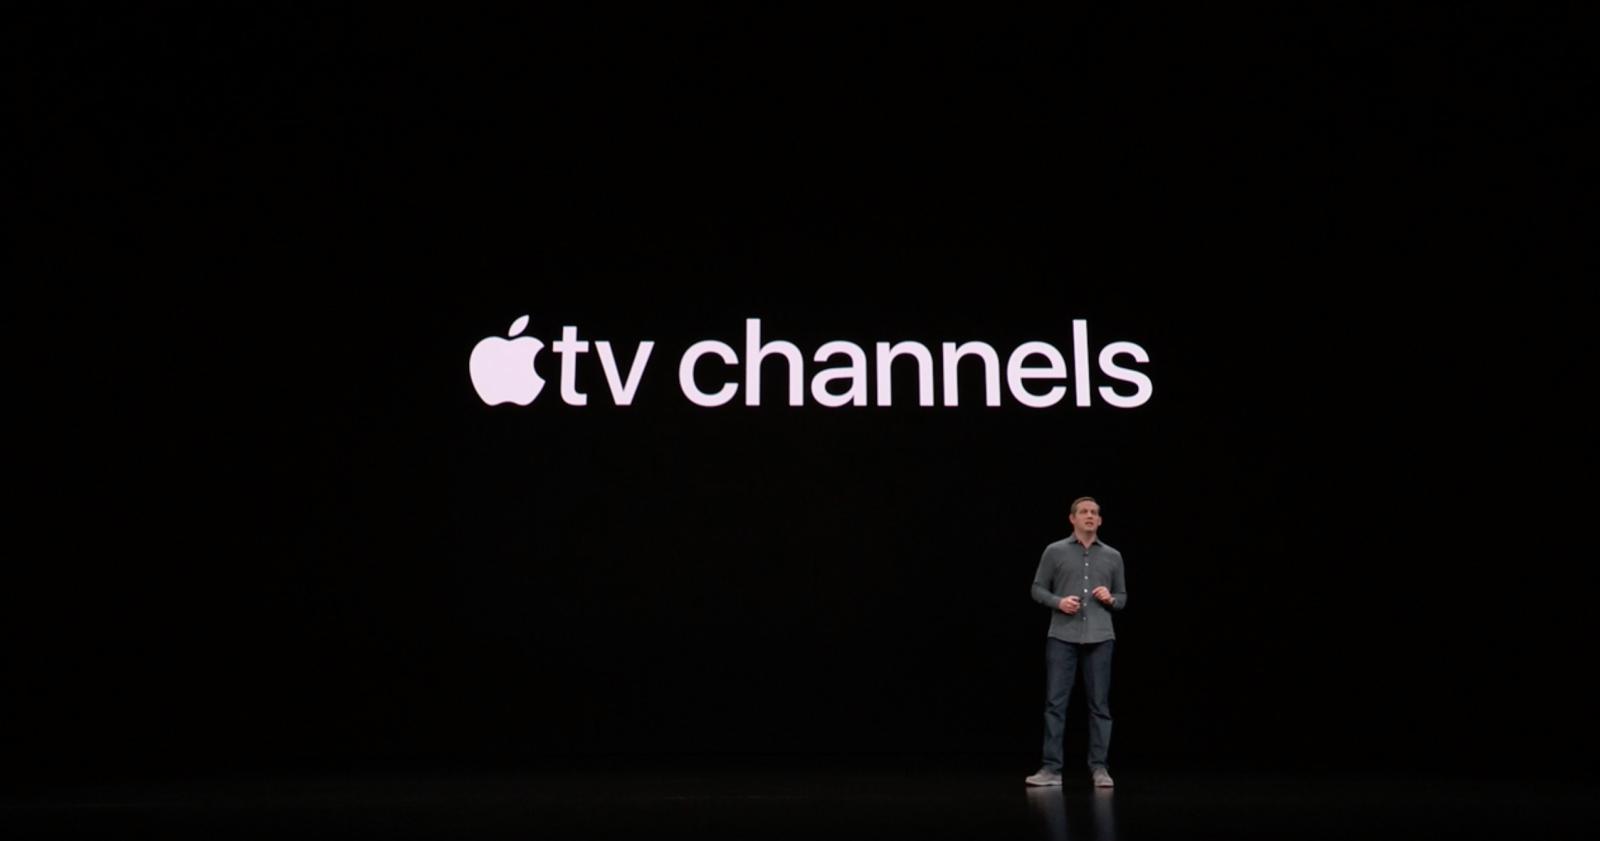 Apple announces 'allnew' TV app with 'Apple TV Channels